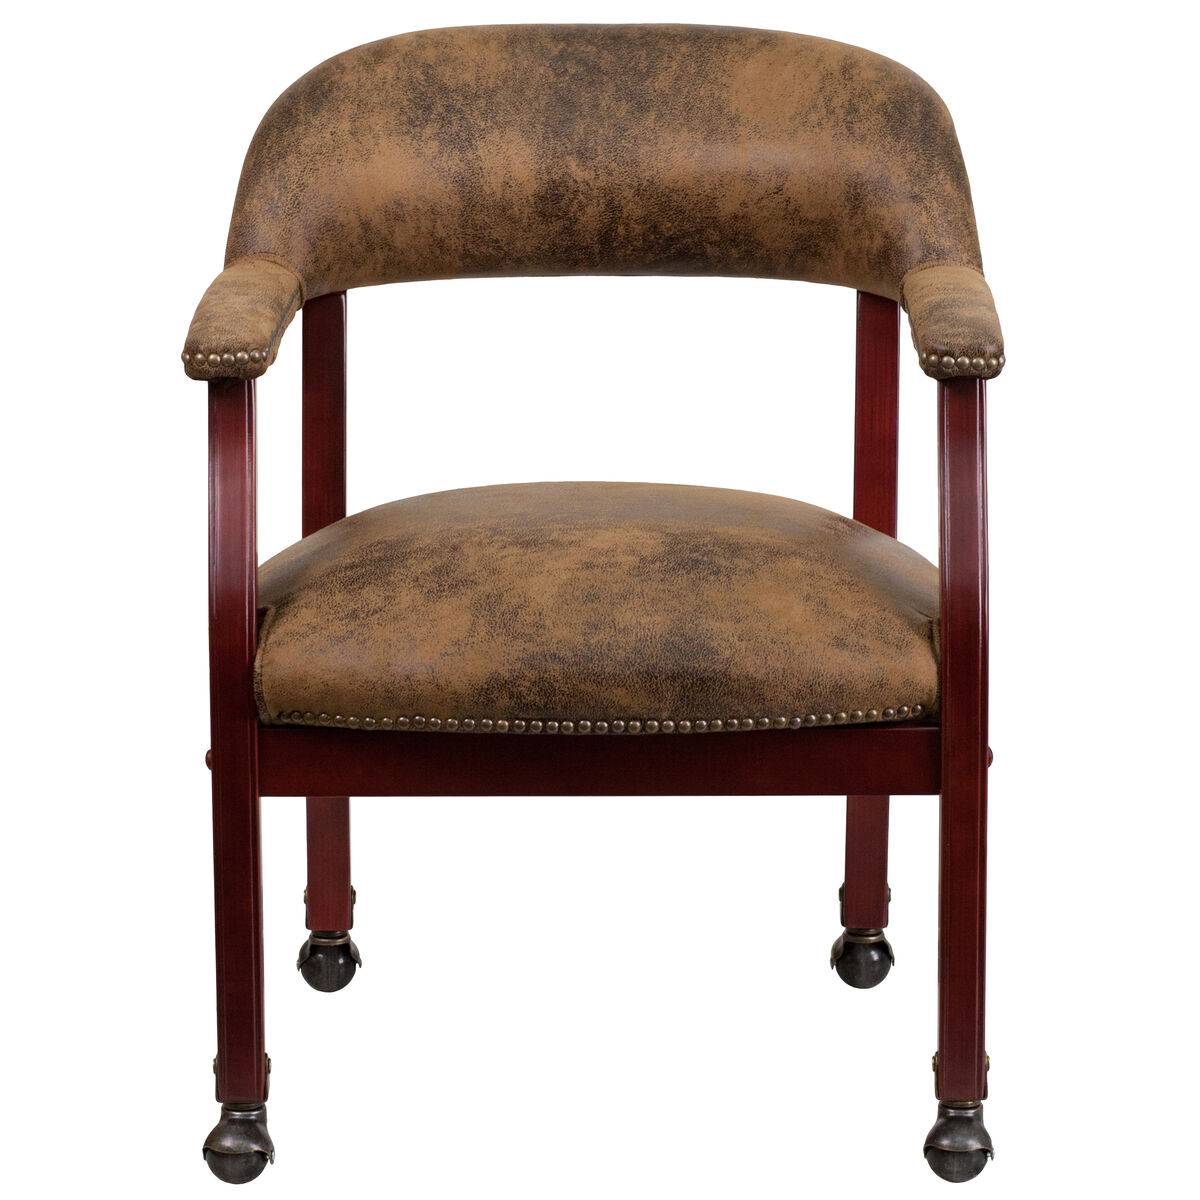 Brown Microfiber Guest Chair B-Z100-BRN-GG | Bizchair.com